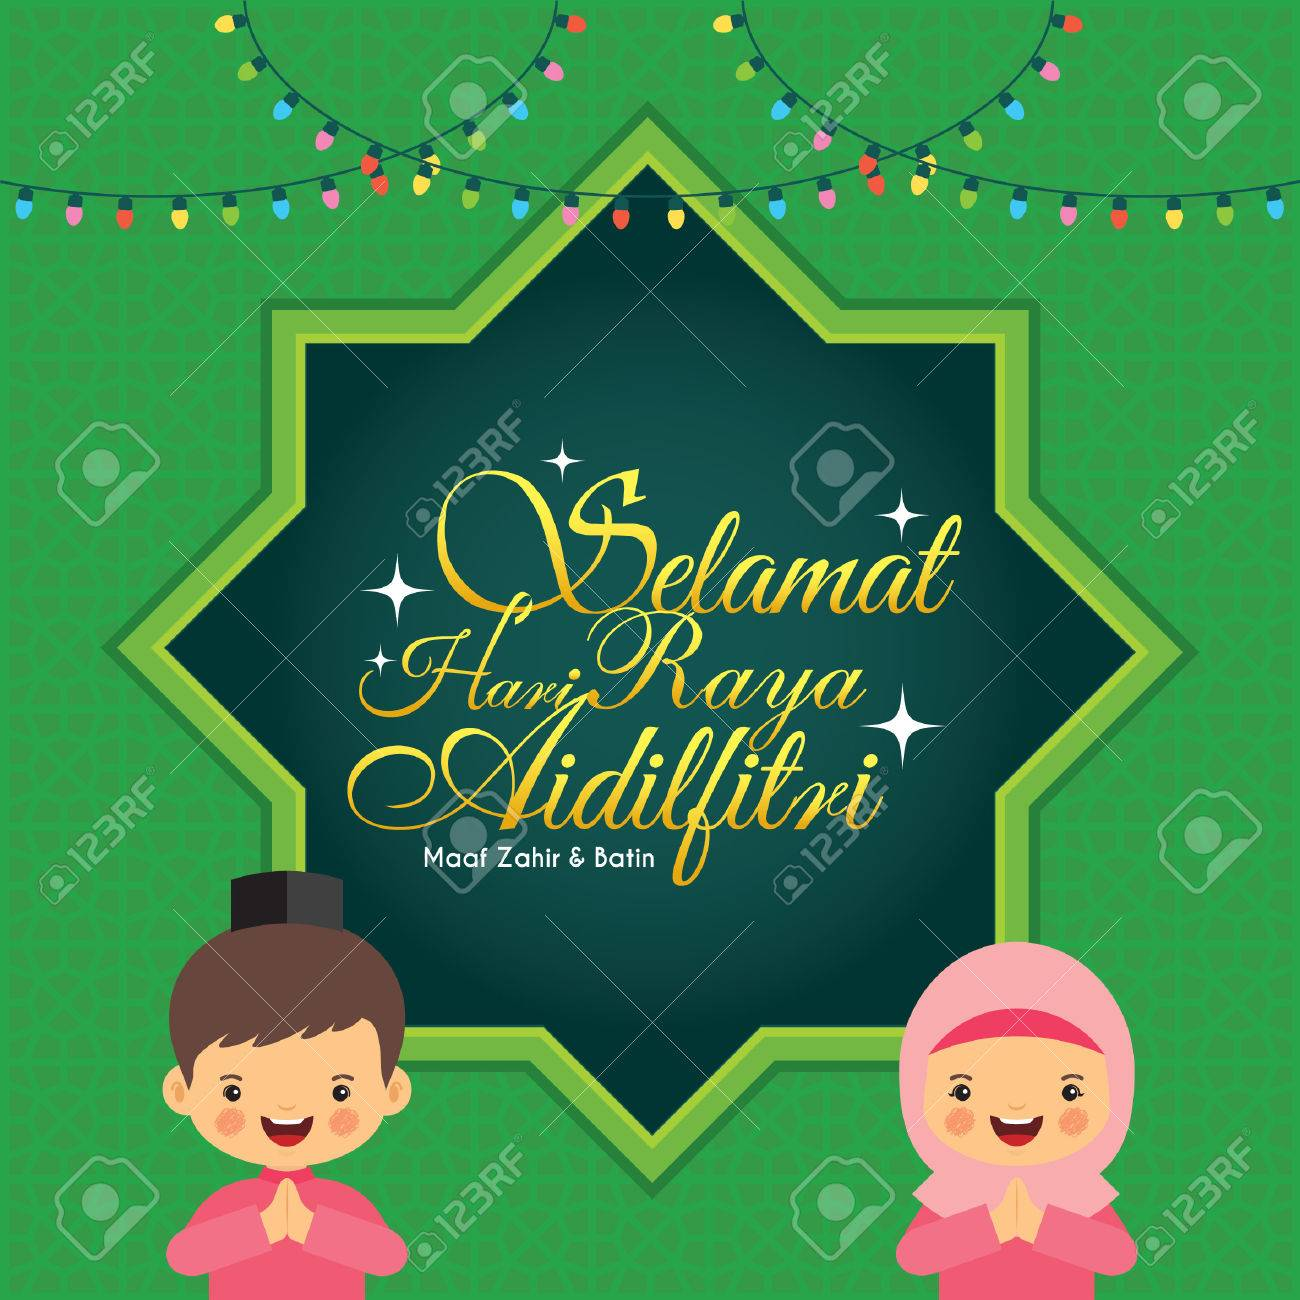 Hari raya aidilfitri vector illustration cute muslim kids with hari raya aidilfitri vector illustration cute muslim kids with colorful light bulbs and frame kristyandbryce Images